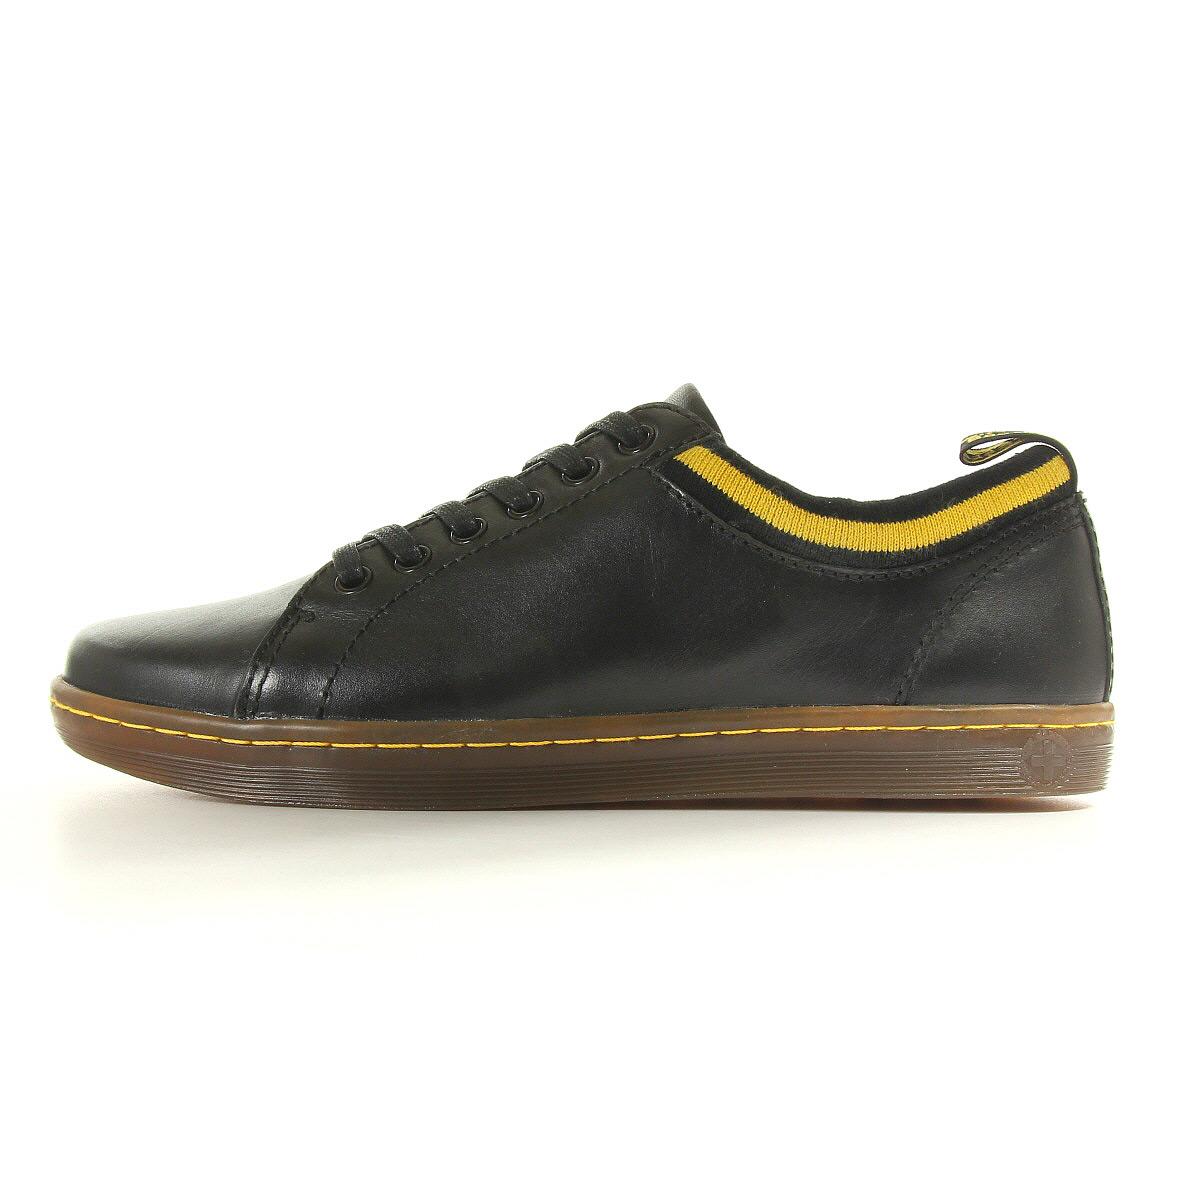 chaussures baskets doc martens homme trenton taille noir